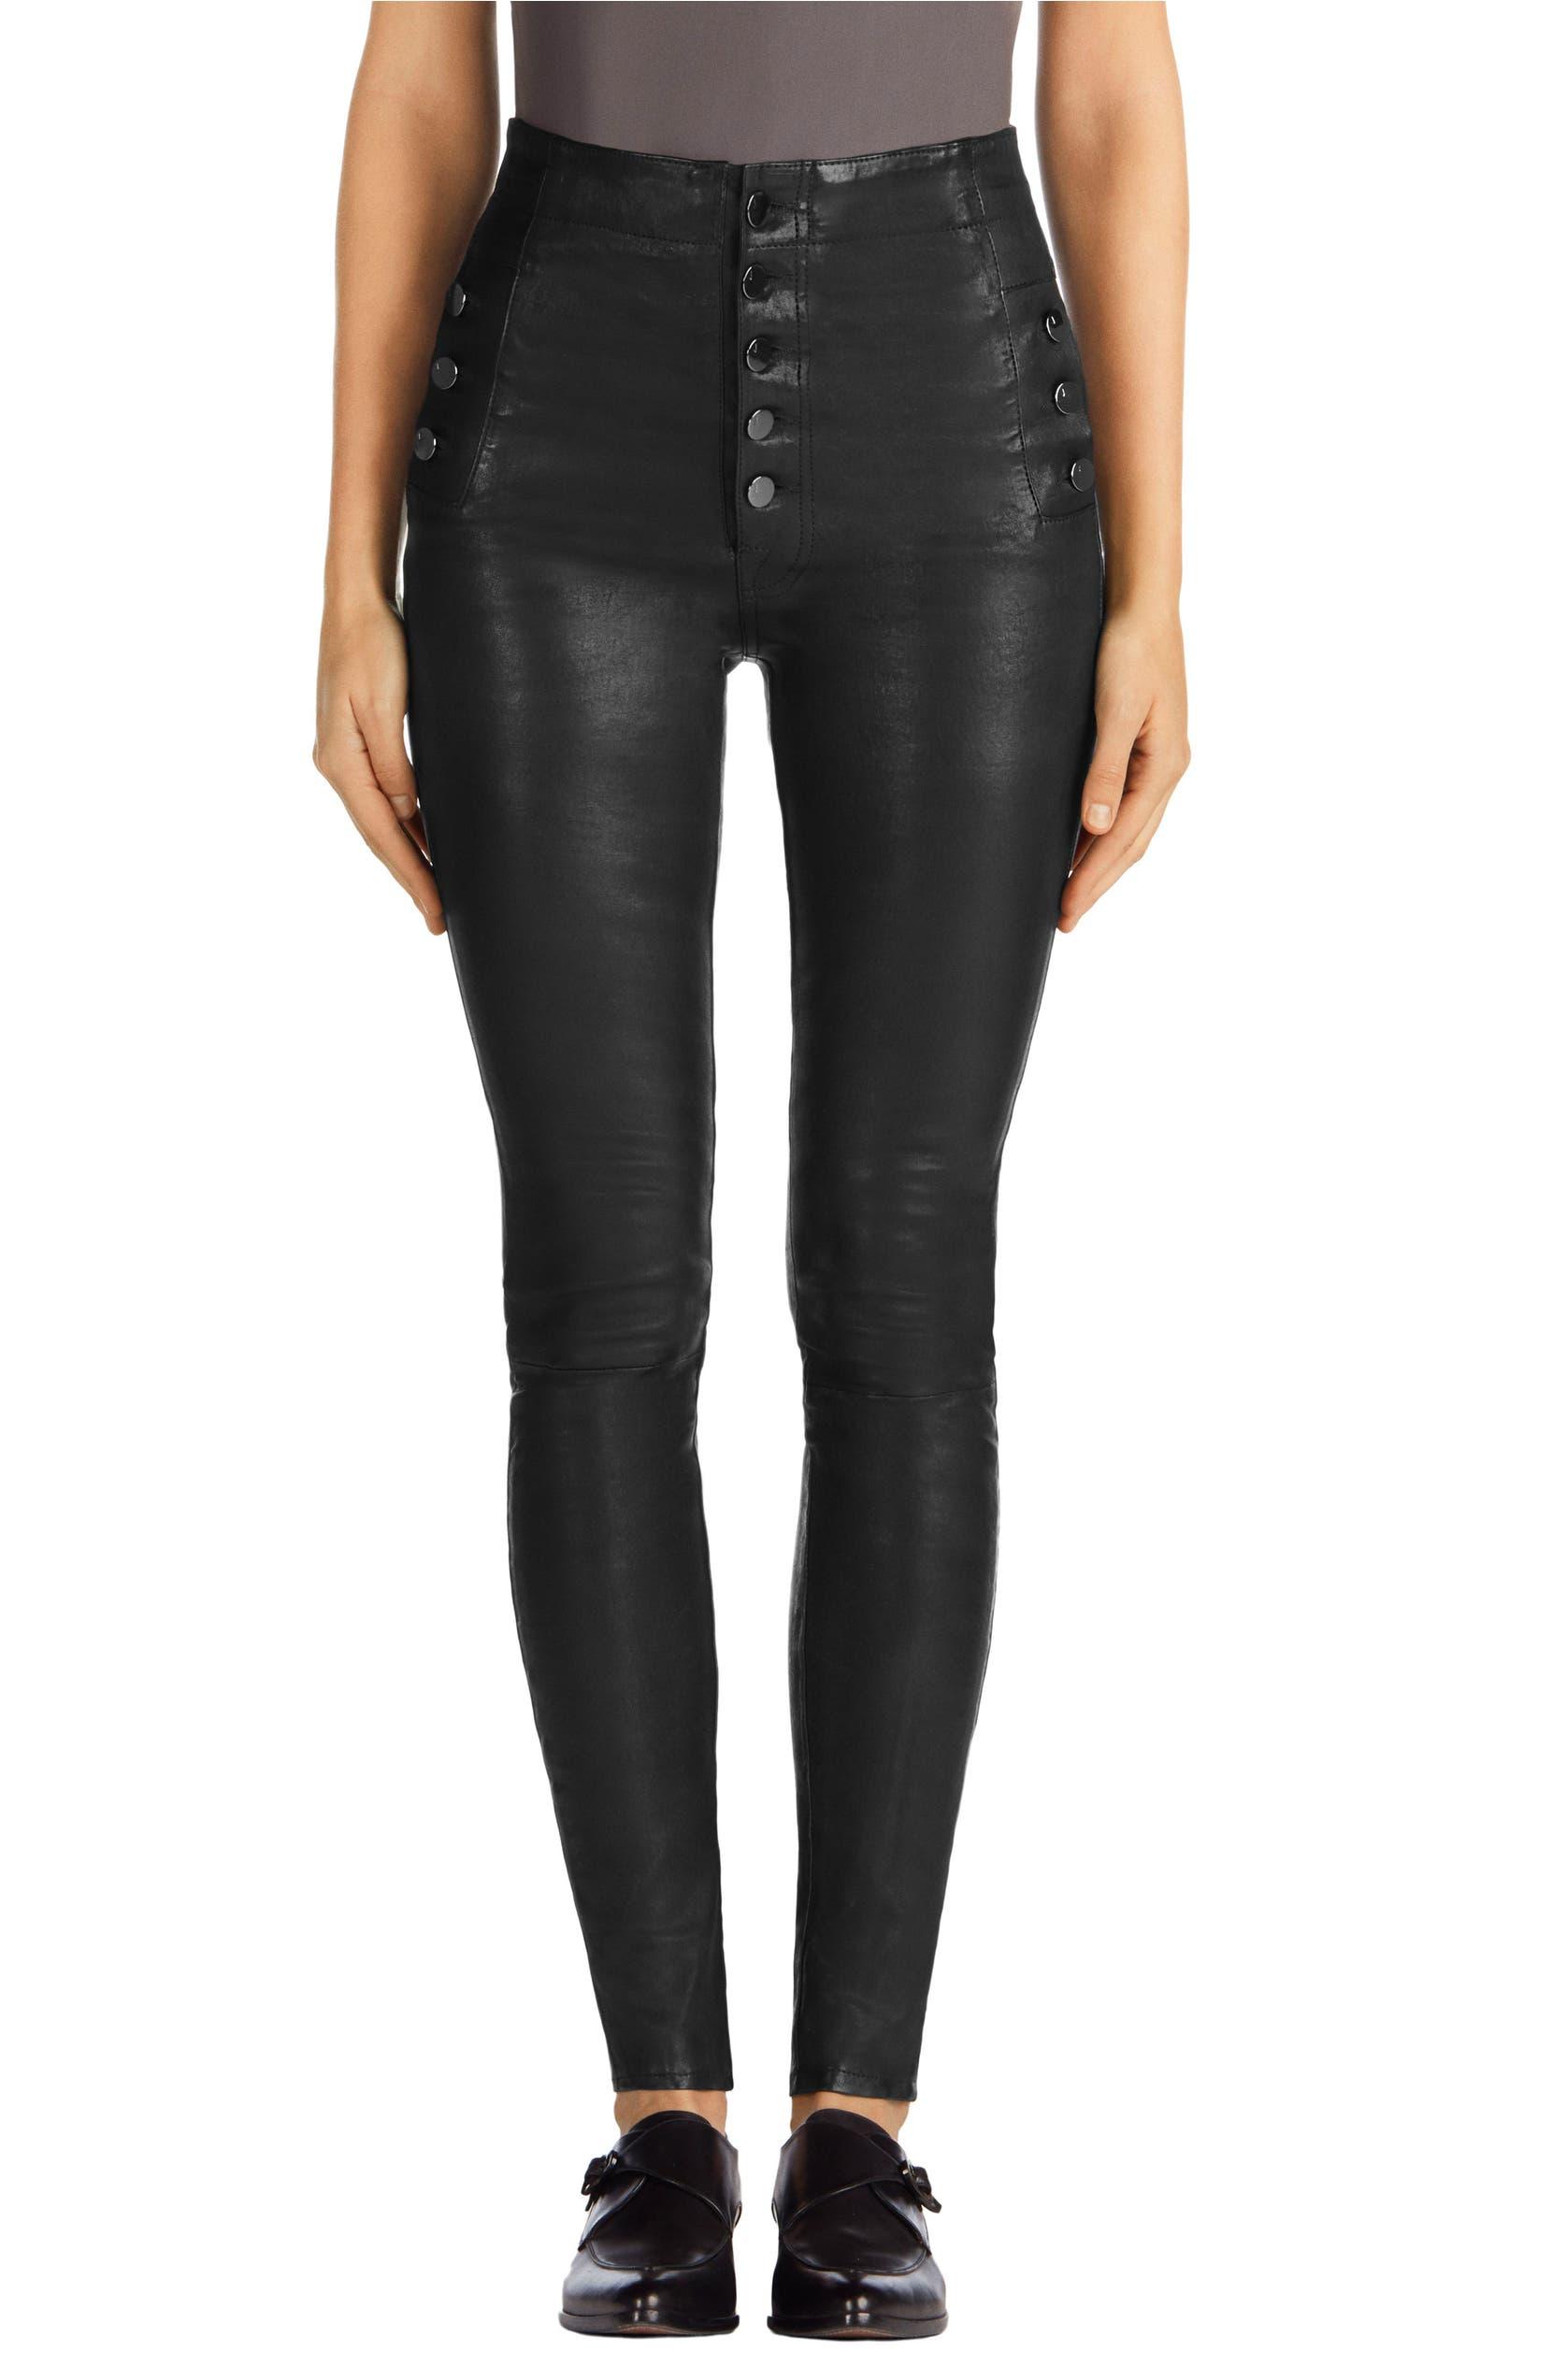 9503c7cc12 J Brand Natasha High Waist Skinny Leather Pants | Nordstrom